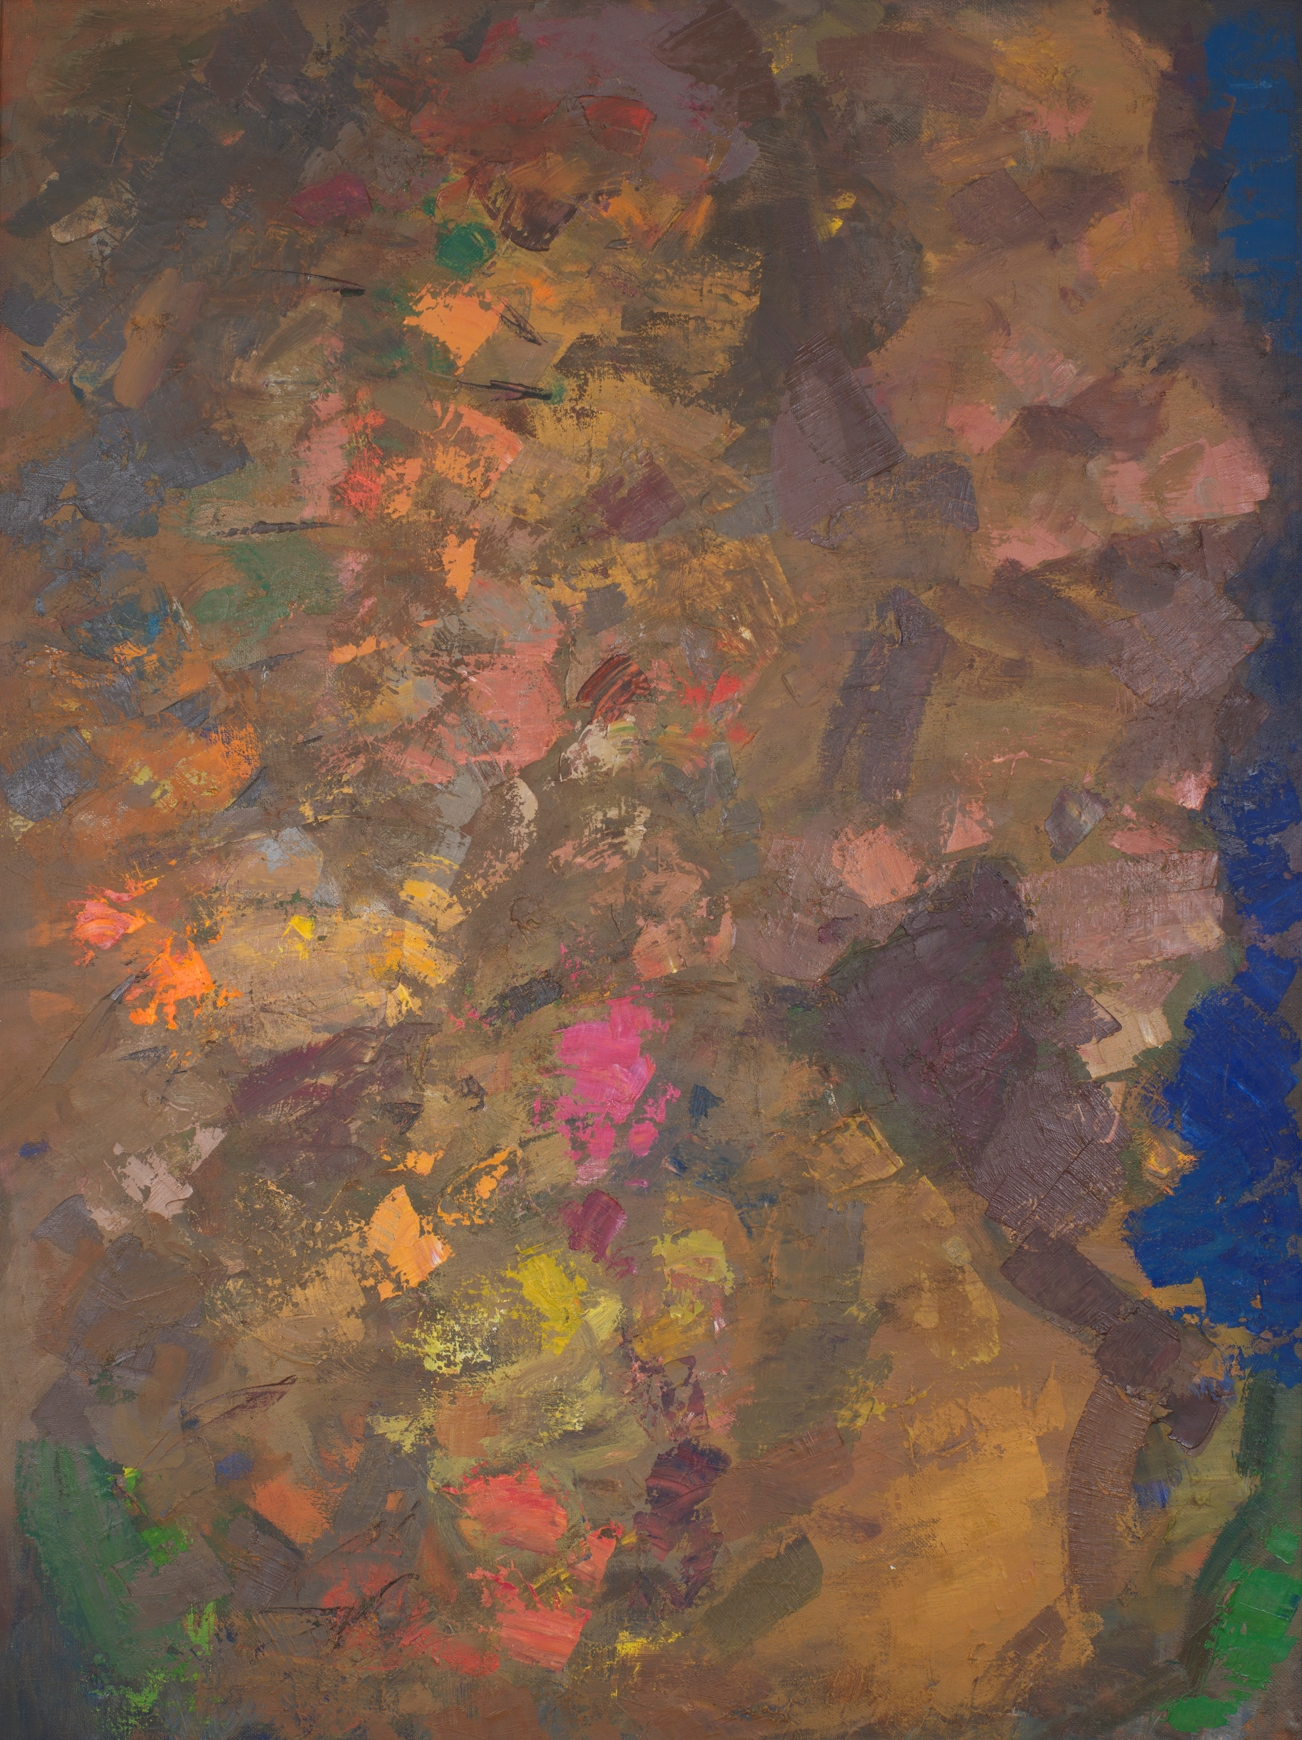 Гранатовый сад на караванной дороге. 1992. Холст, масло. 100х120. Из собрания Фонда Марджани.jpg